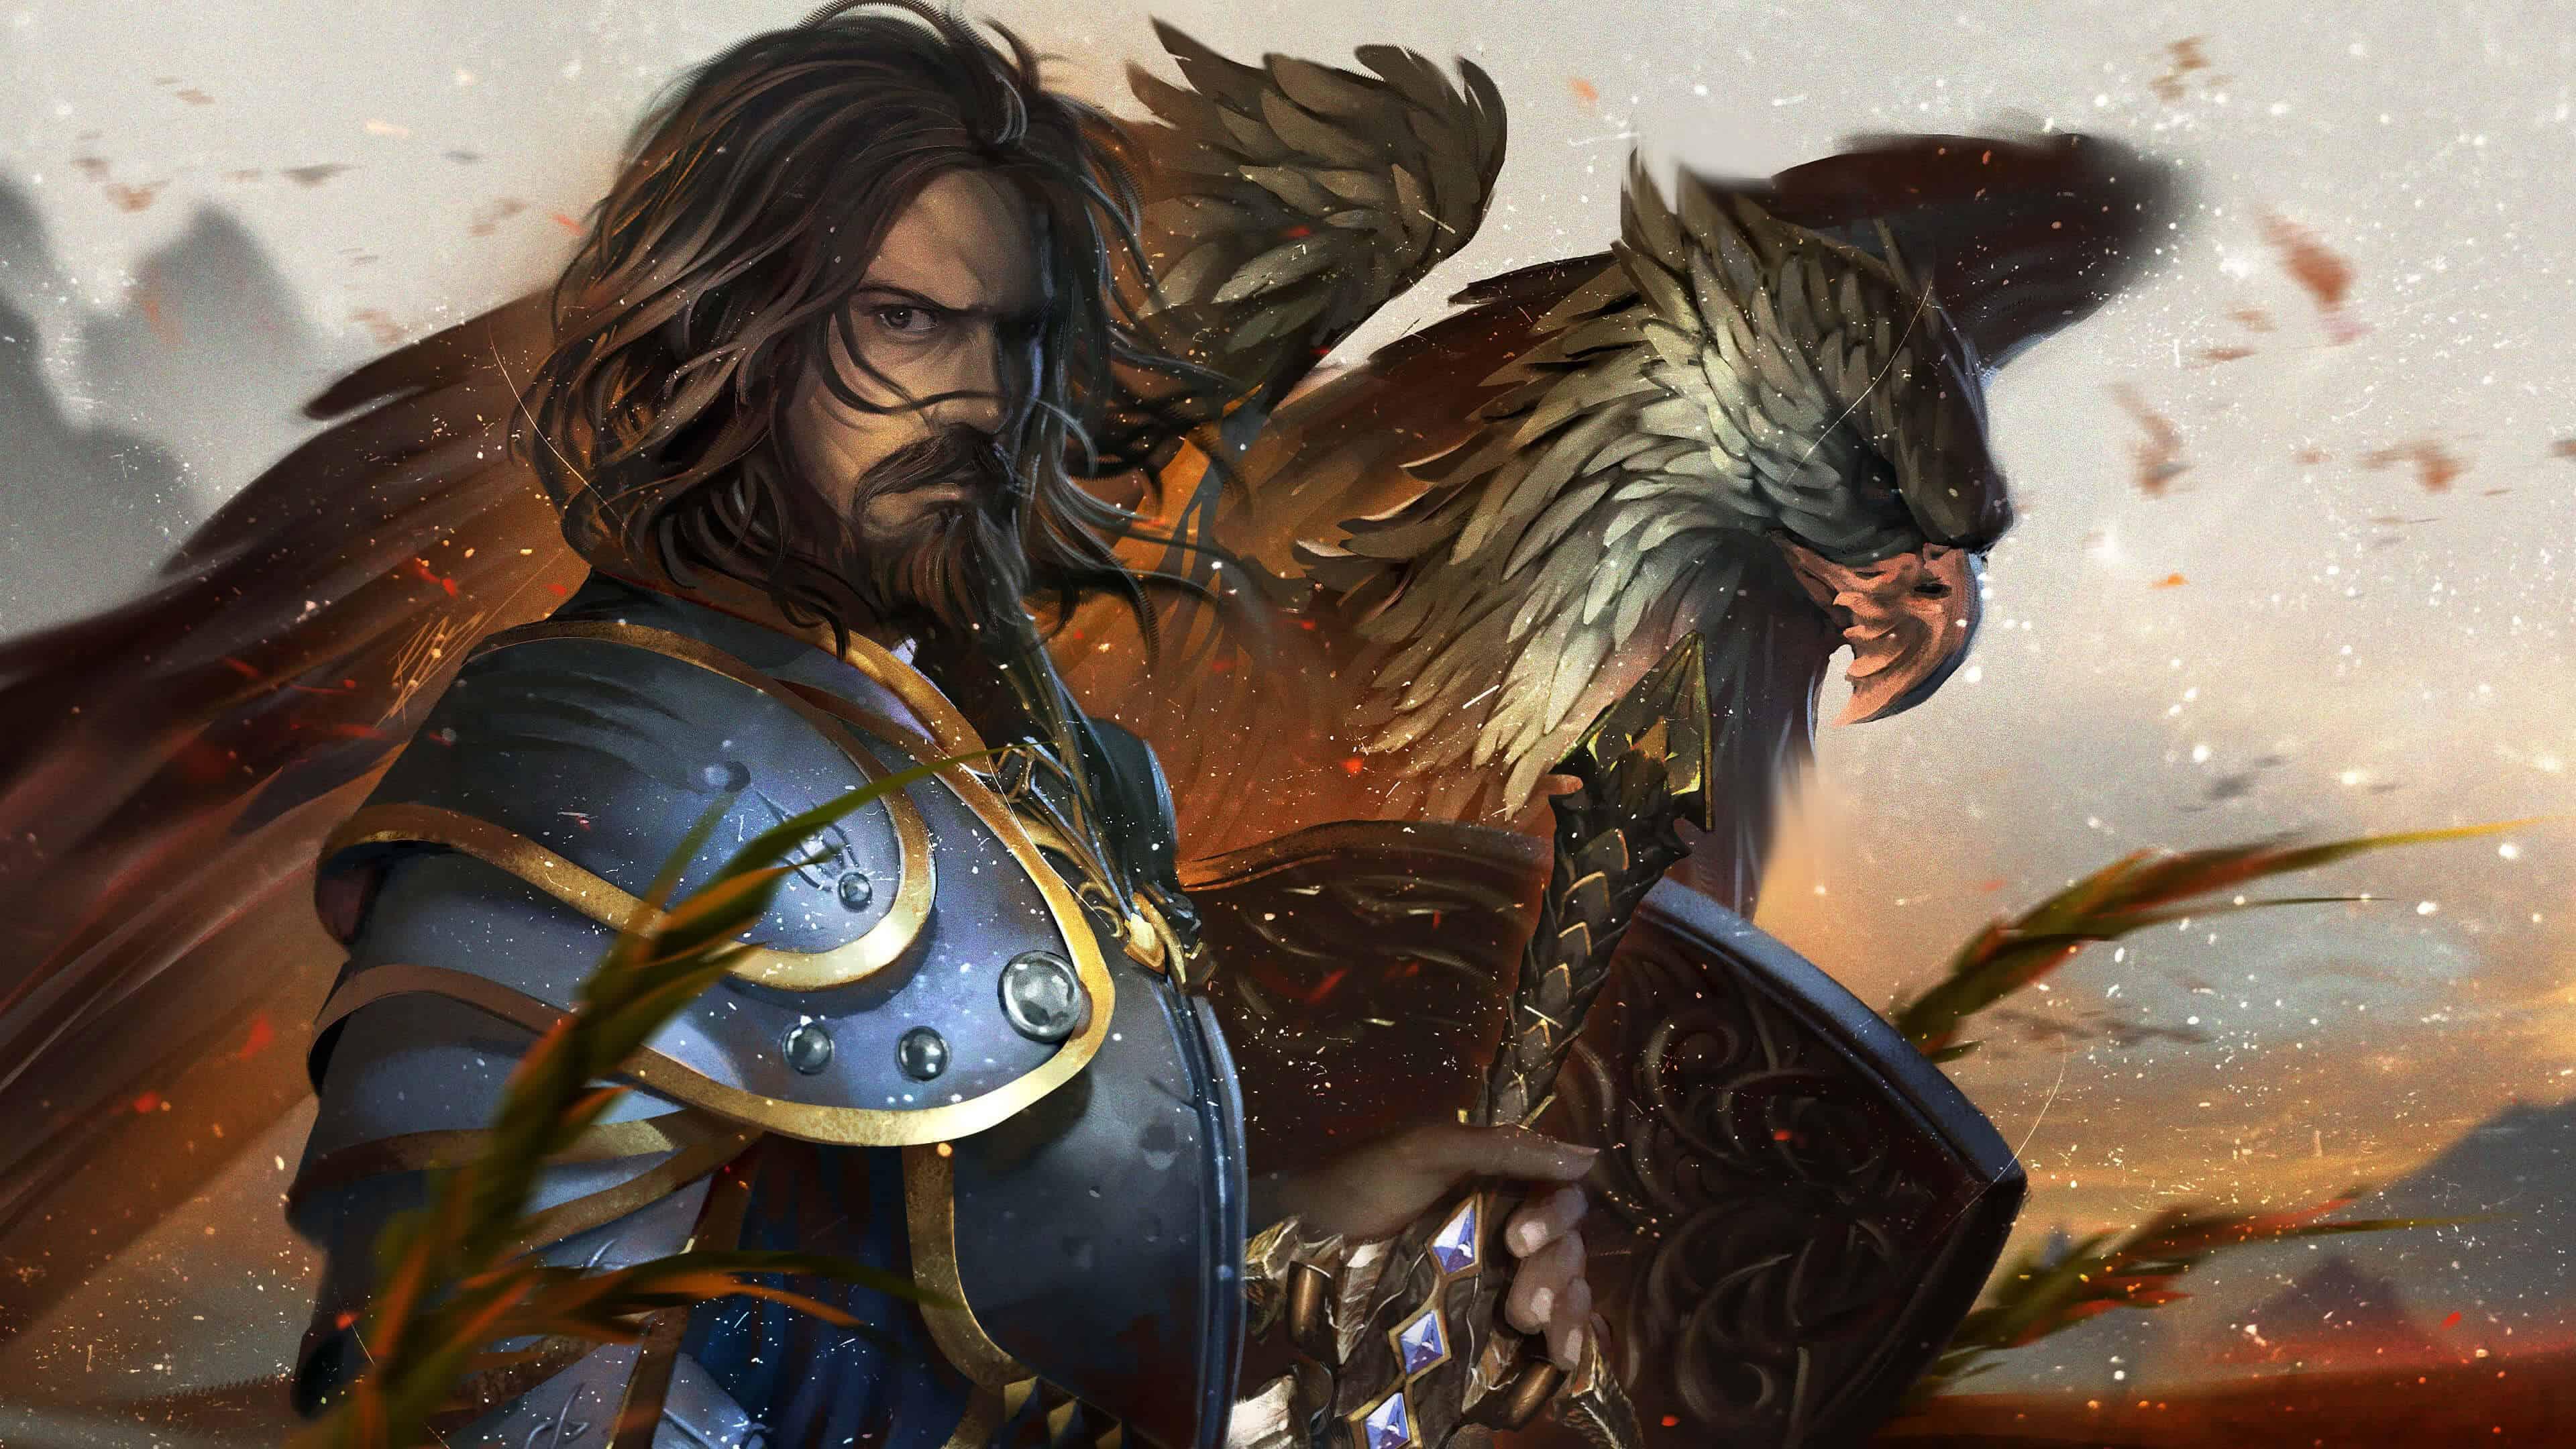 World Of Warcraft Anduin Lothar UHD 4K Wallpaper Pixelz 3840x2160